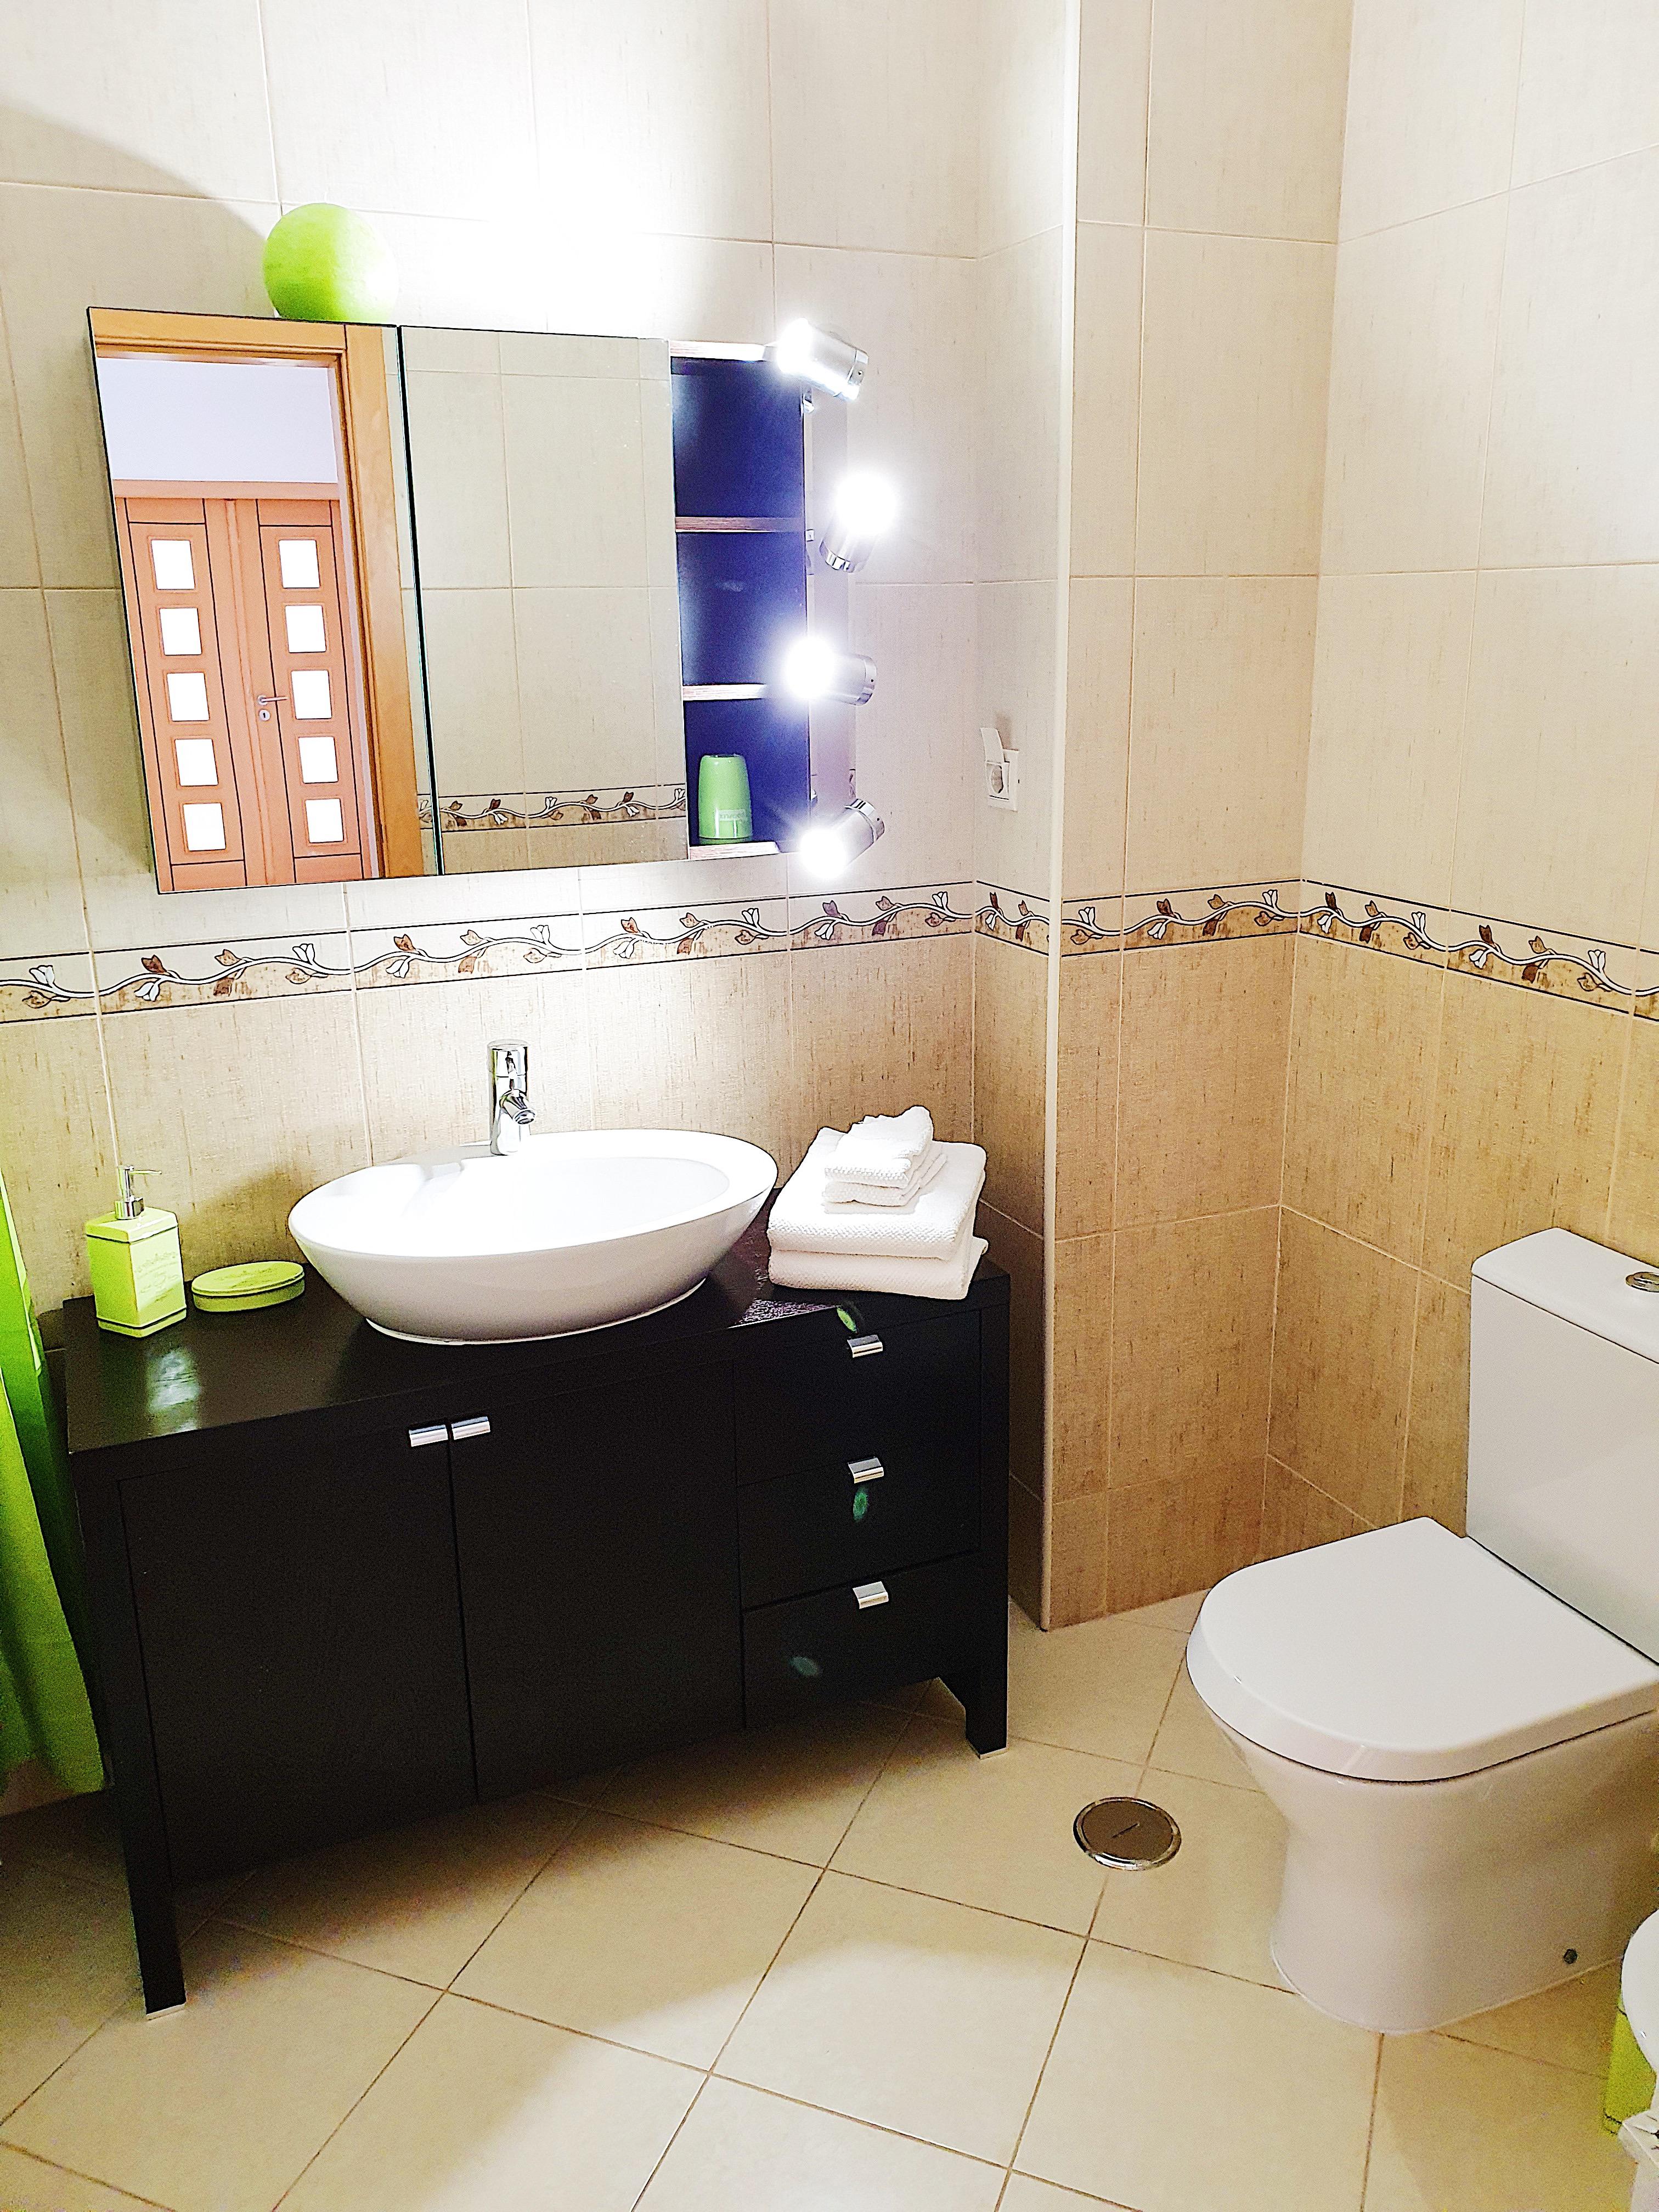 Location appartements et villas de vacance, Arrendamento para Férias – Location de vacance à Armação de Pêra, Portugal Algarve, REF_IMG_8959_8960